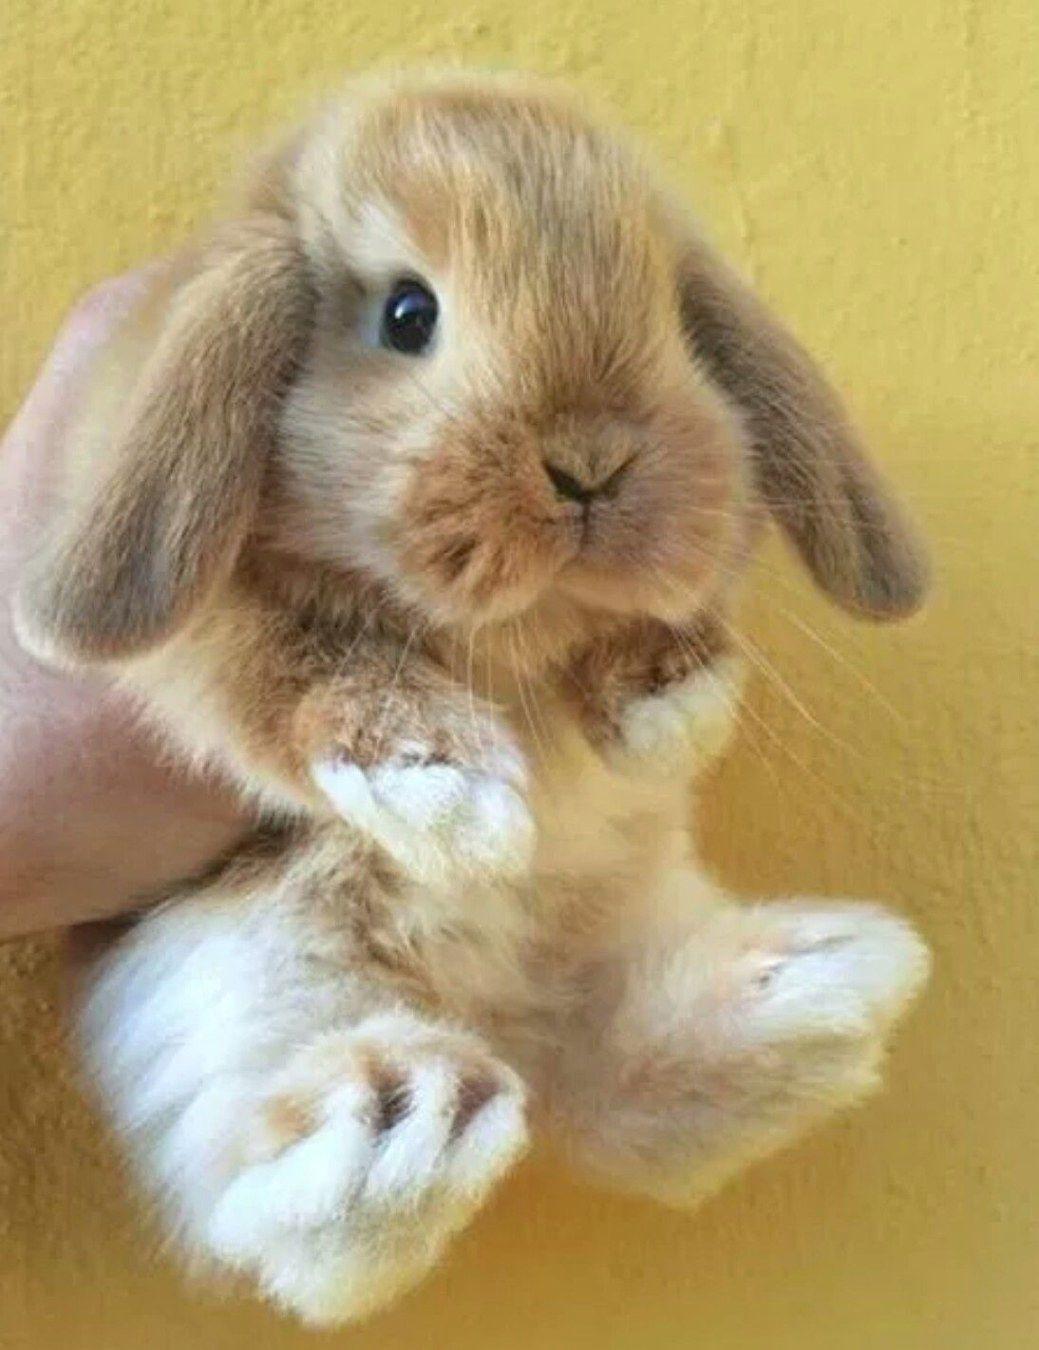 Gorgeous Rabbit Rabbitlove Cute Baby Animals Cute Baby Bunnies Pet Bunny